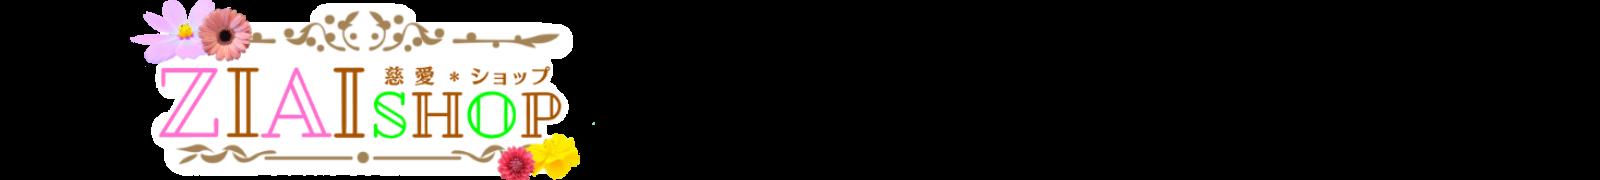 ziaishop